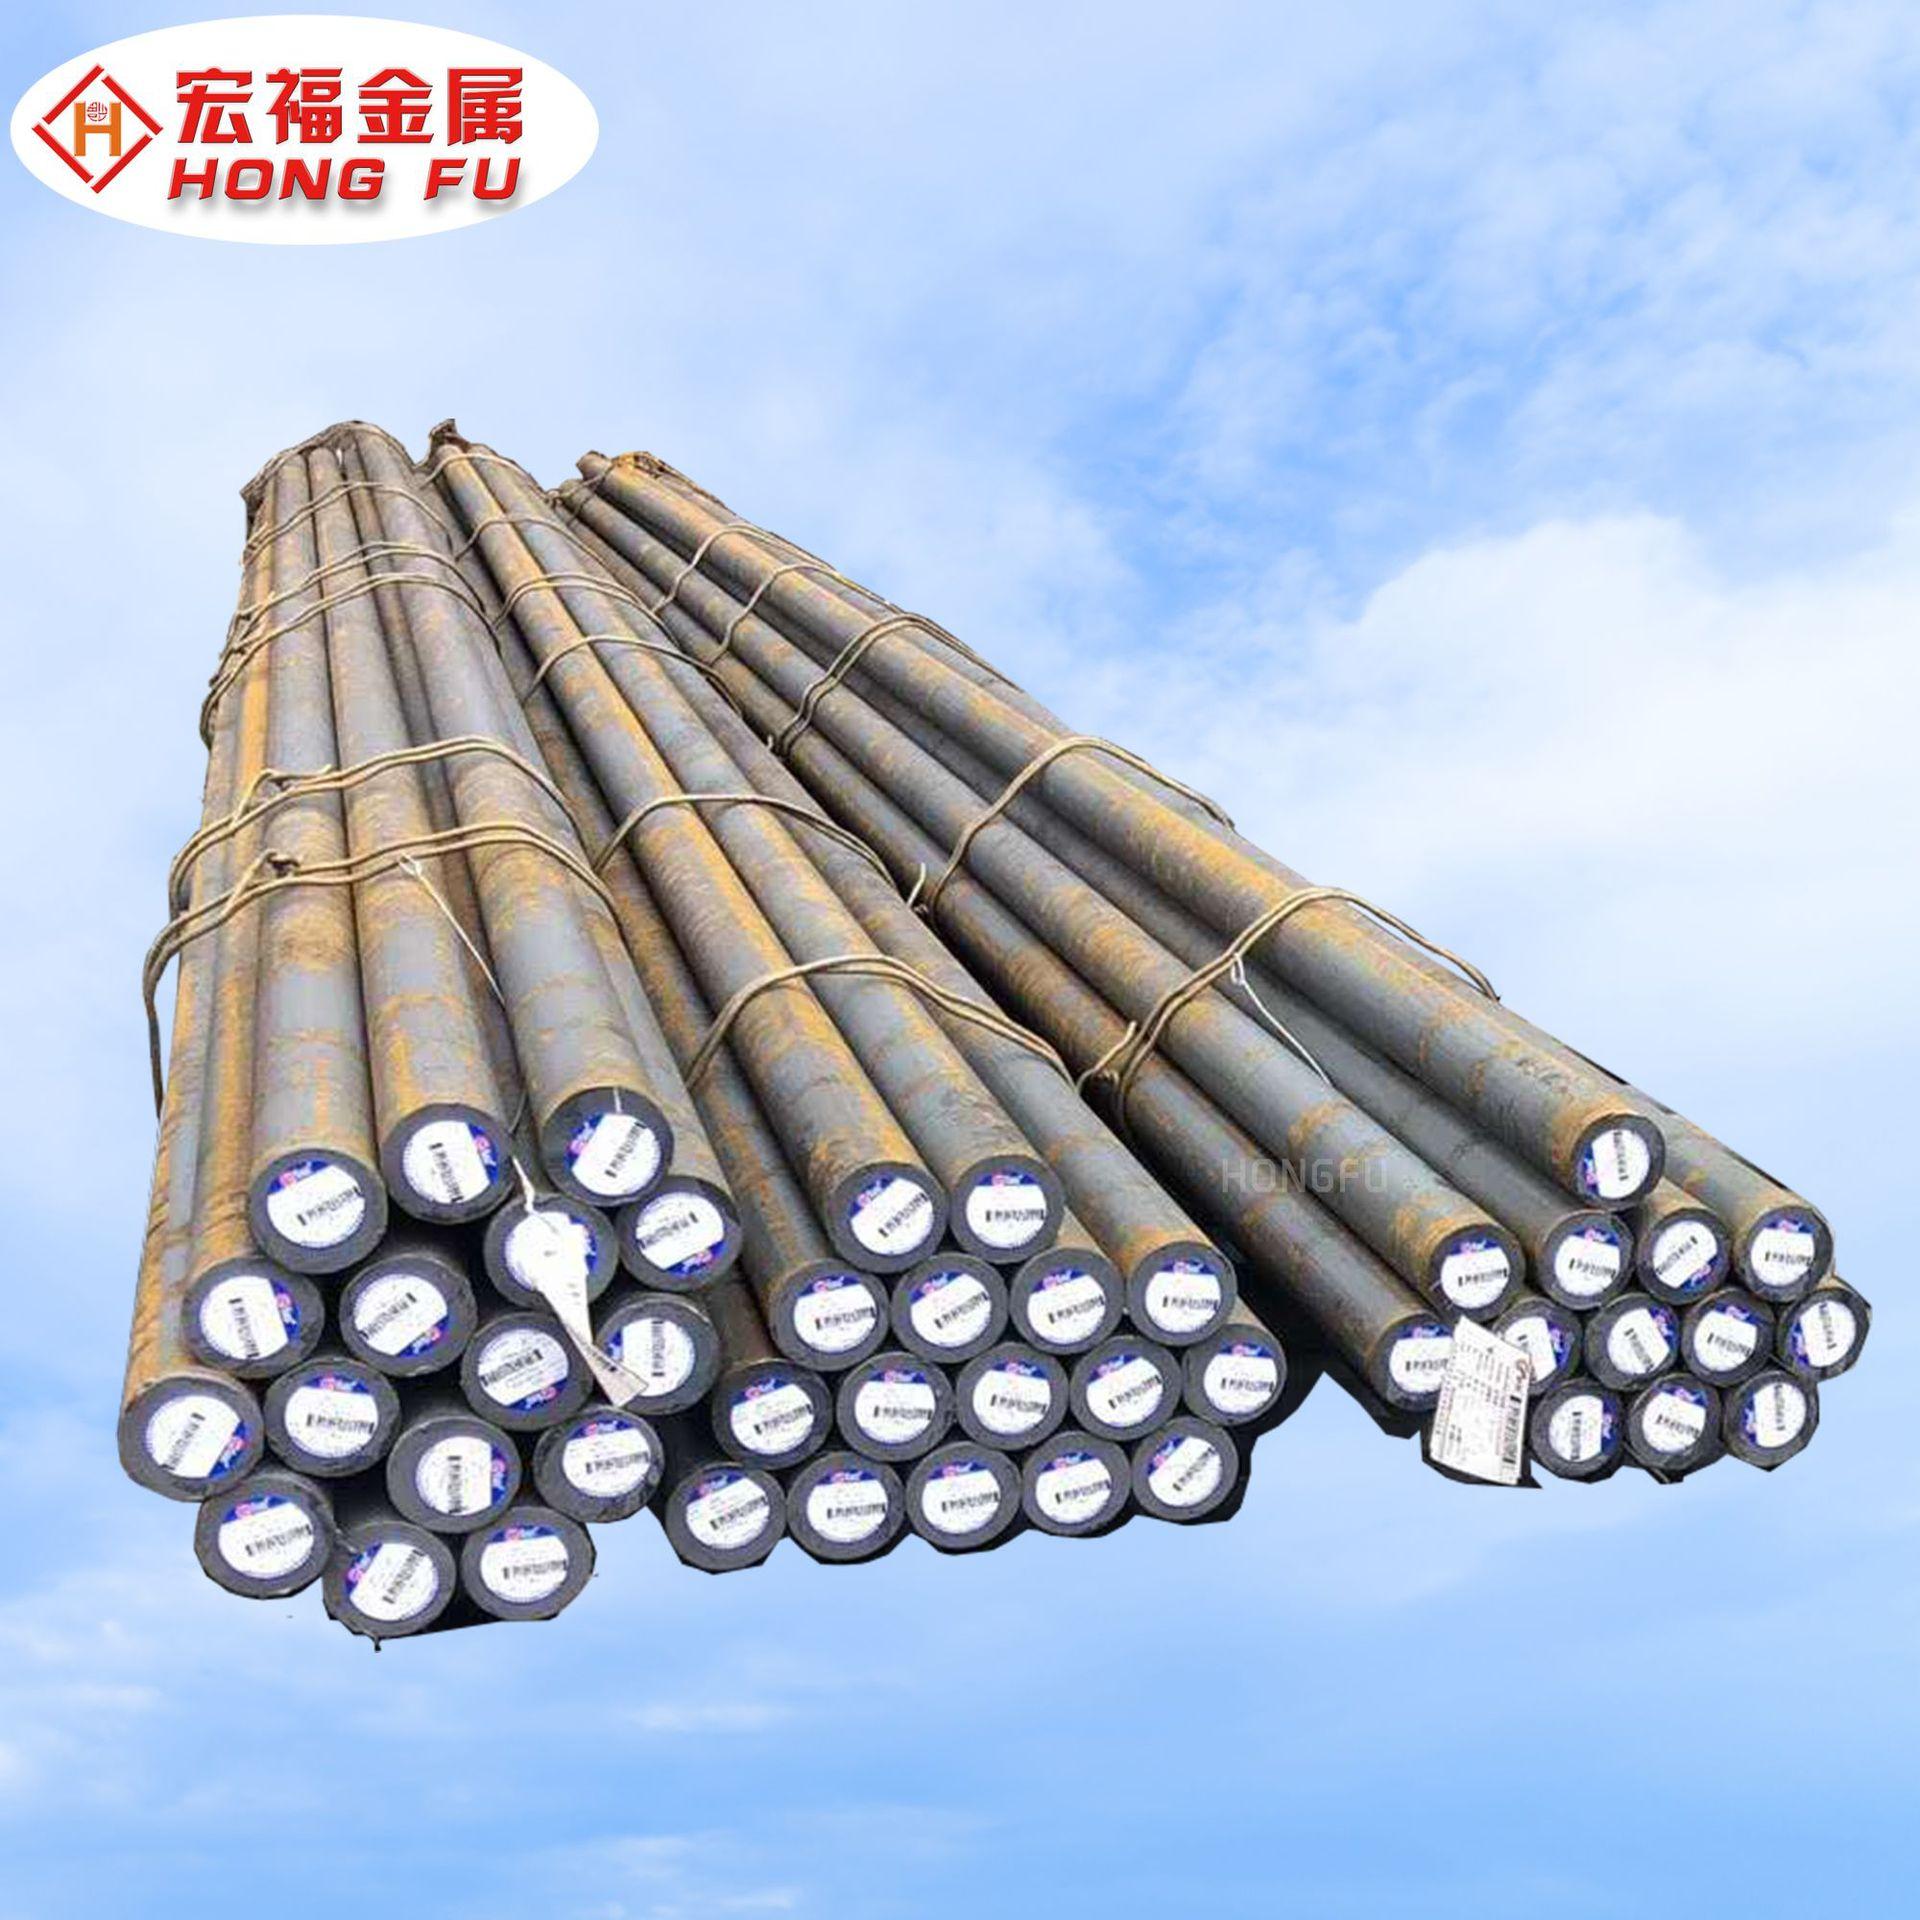 HONGFU 30crni3 round steel 30crni3 special steel 30crni3 alloy steel round steel